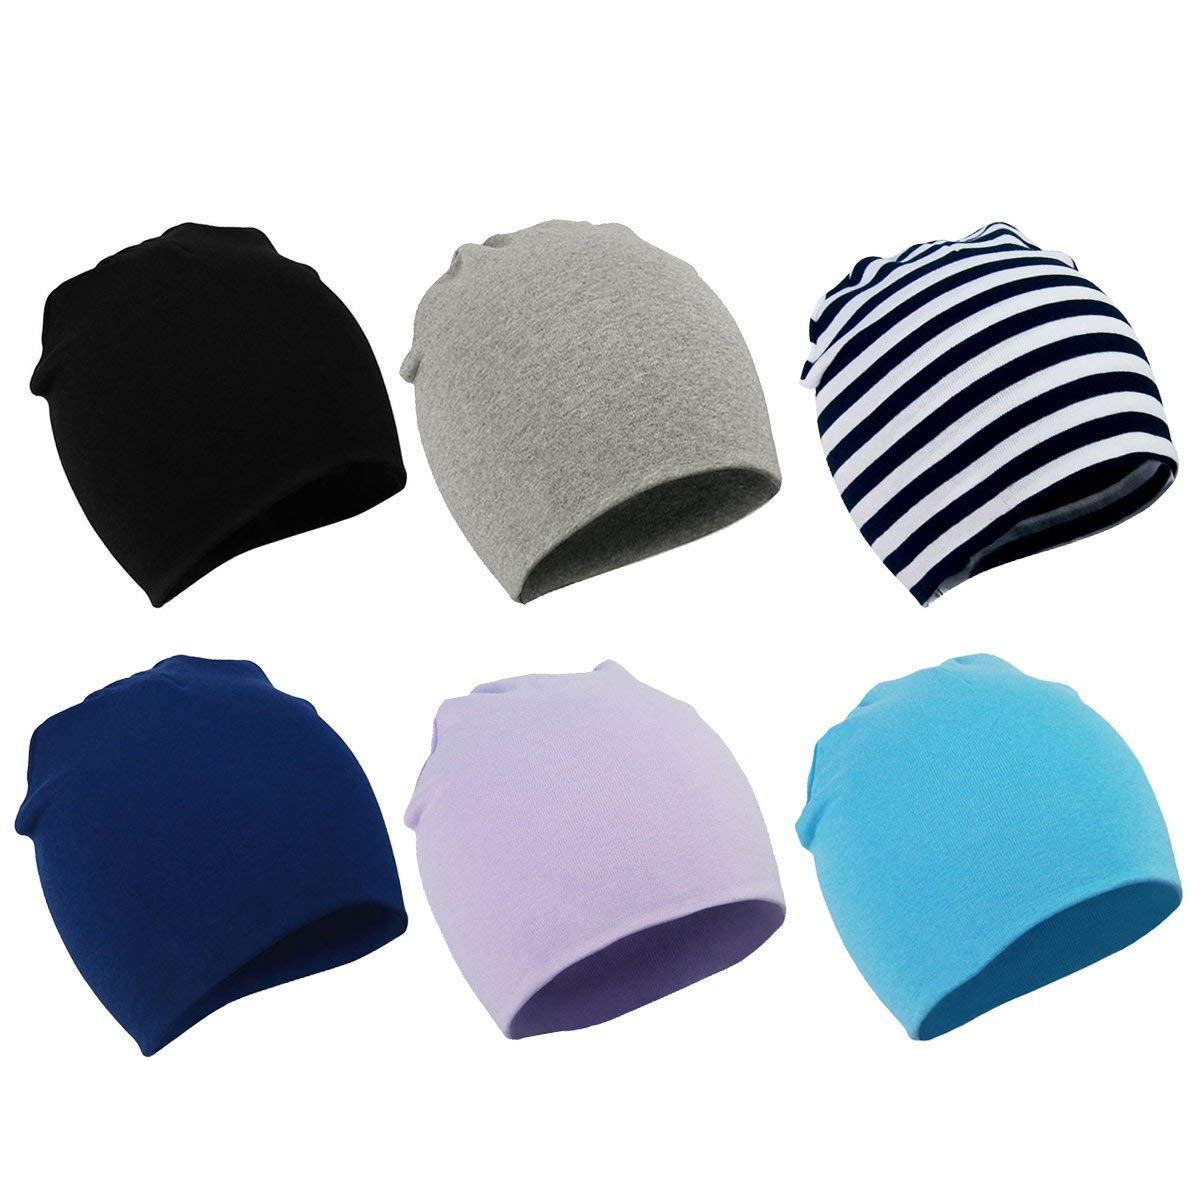 American Trends Kids Baby Toddler Beanie Hats Infant Newborn Nursery Hat Cute Warm Cotton Soft Cap